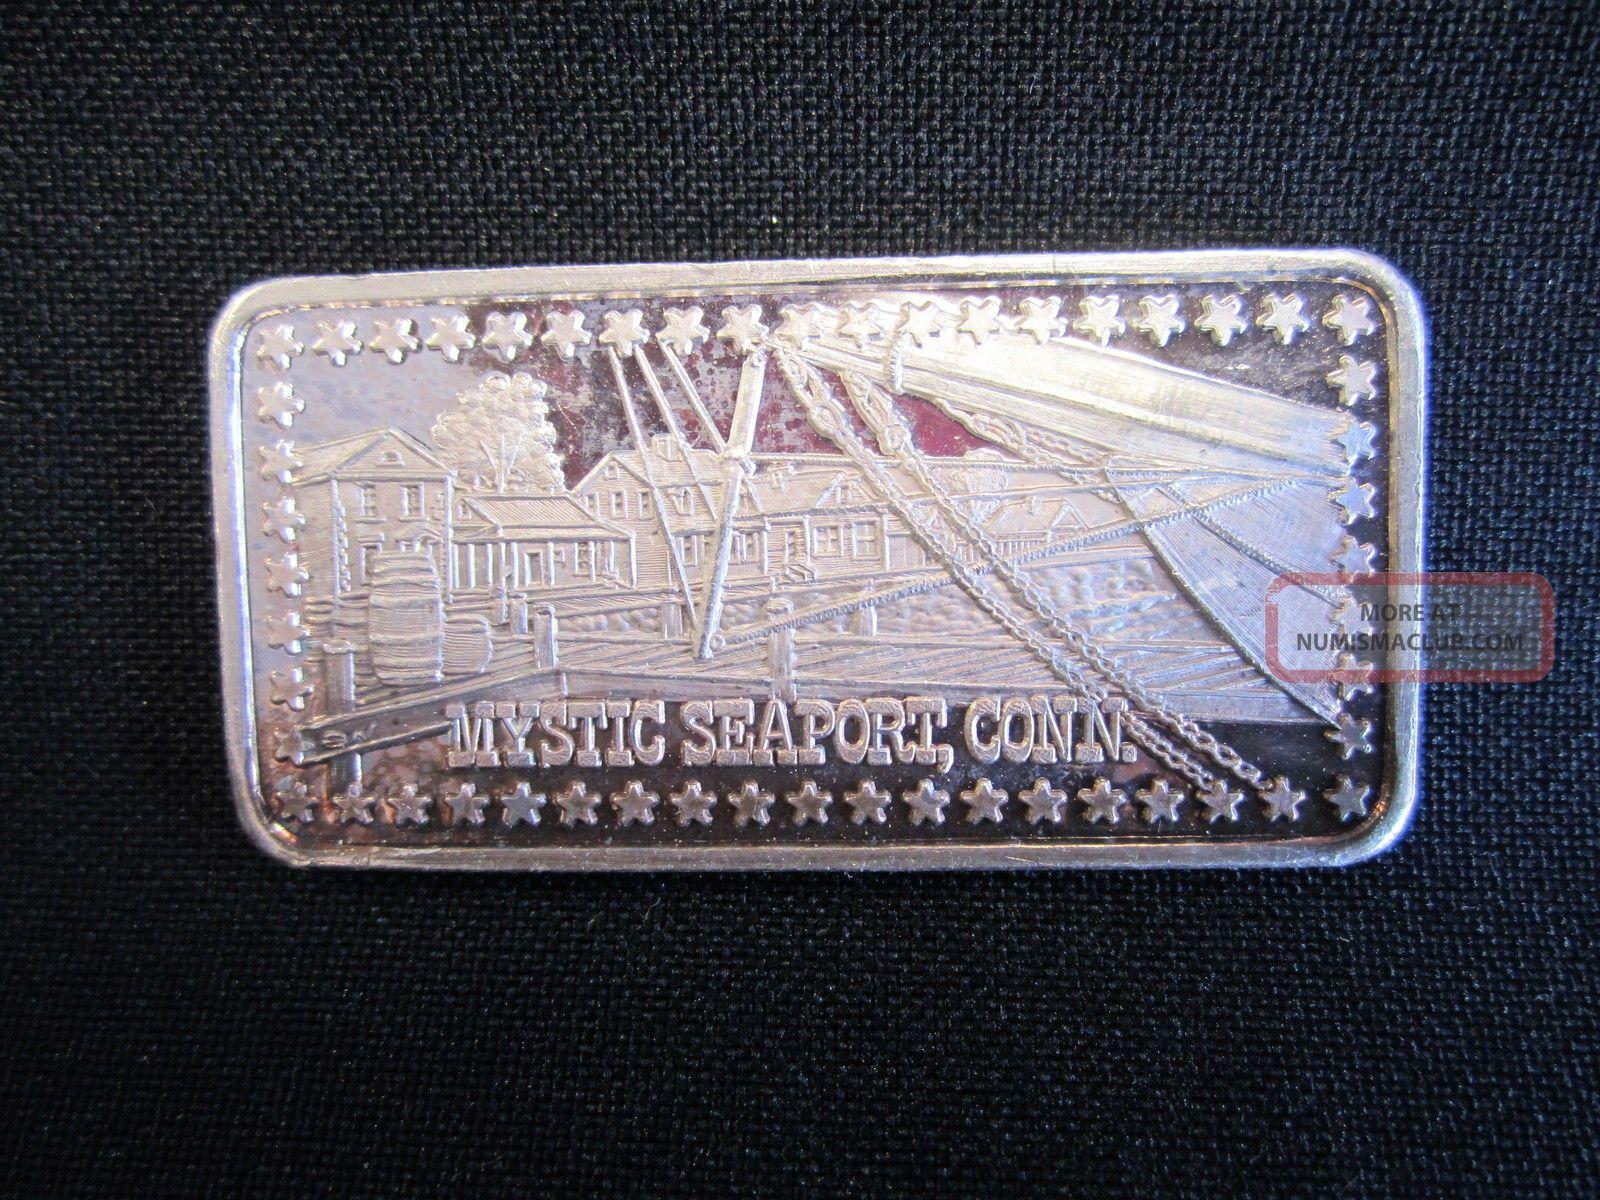 999 Fine Pure Silver Bar Ingot Bullion Mystic Seaport